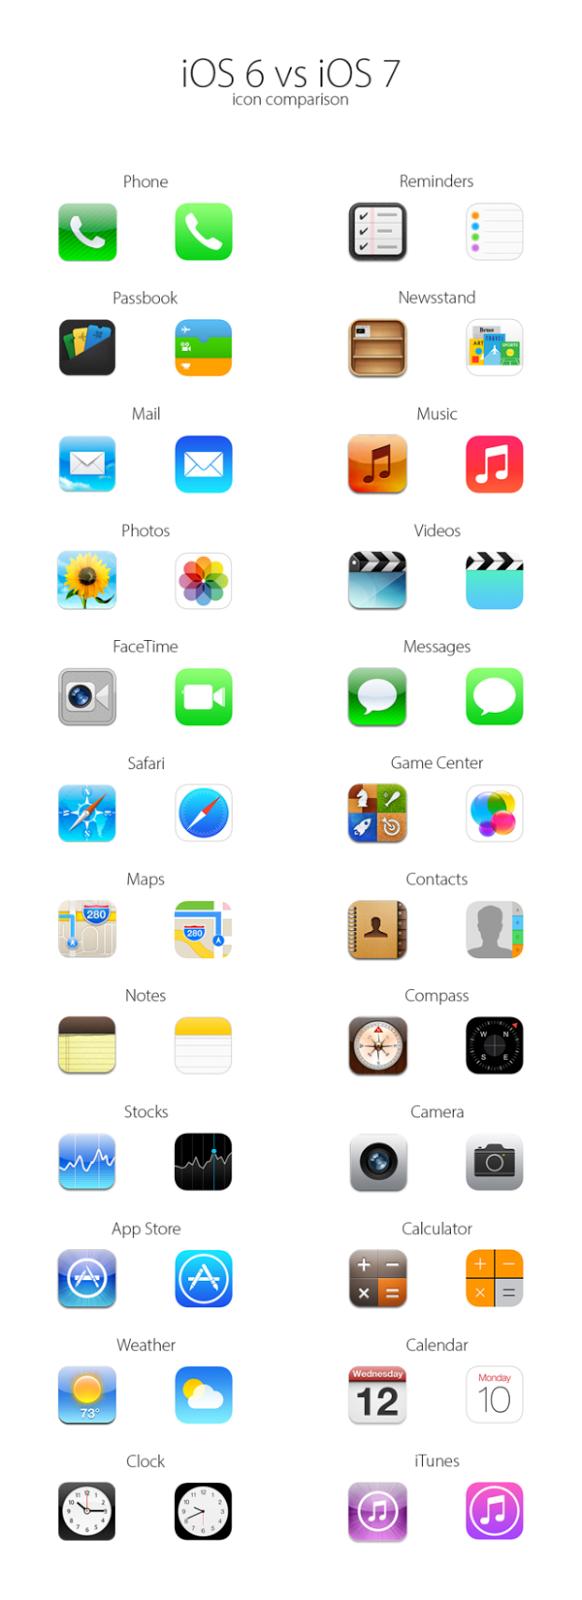 【iPhone】首頁演化史+今昔icon比較圖